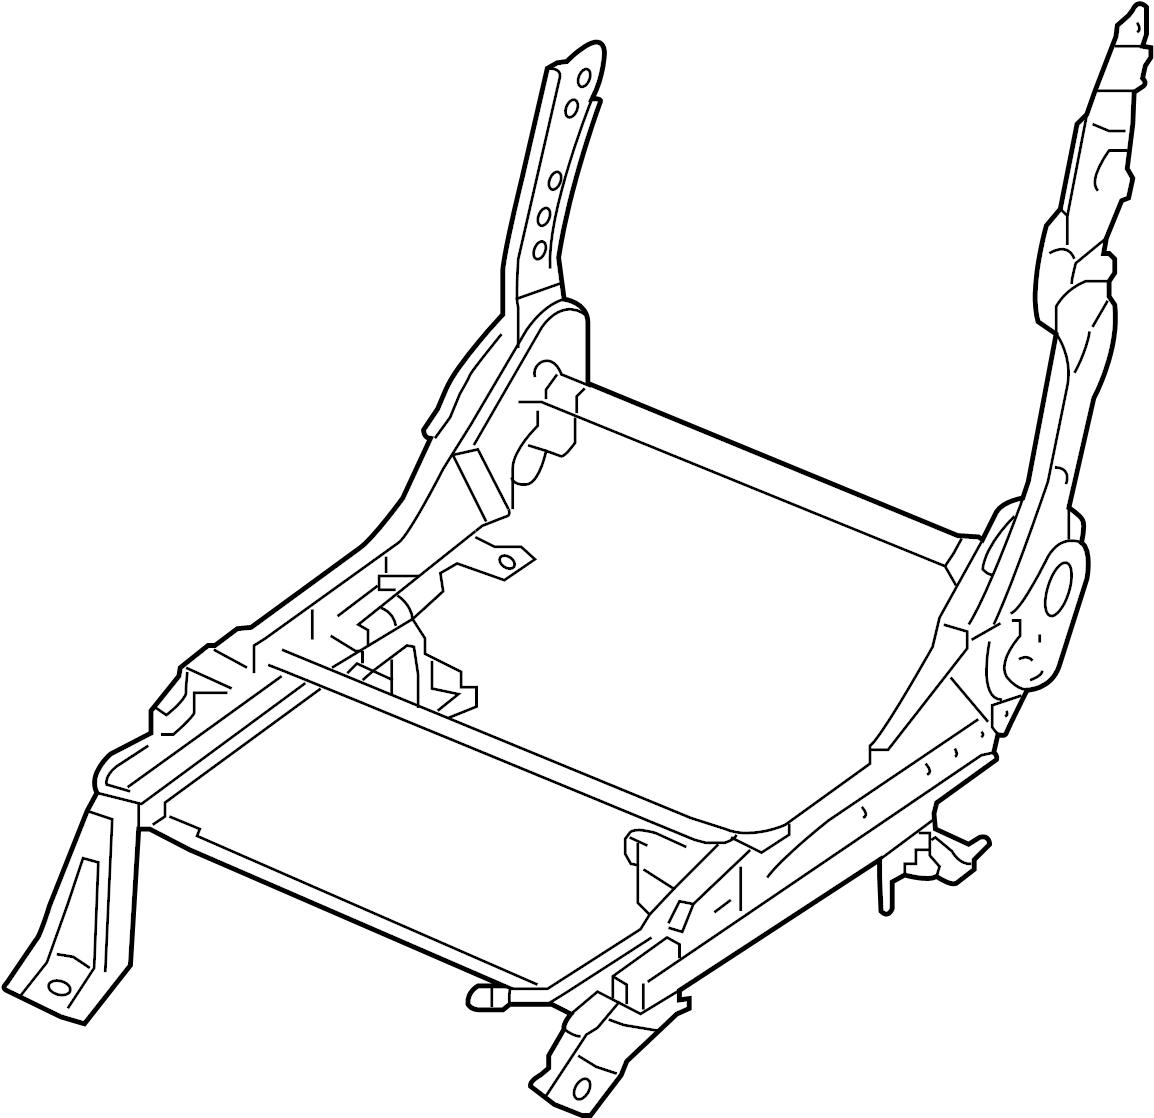 Nissan Pathfinder Seat Track Adjust Mechanism (Right